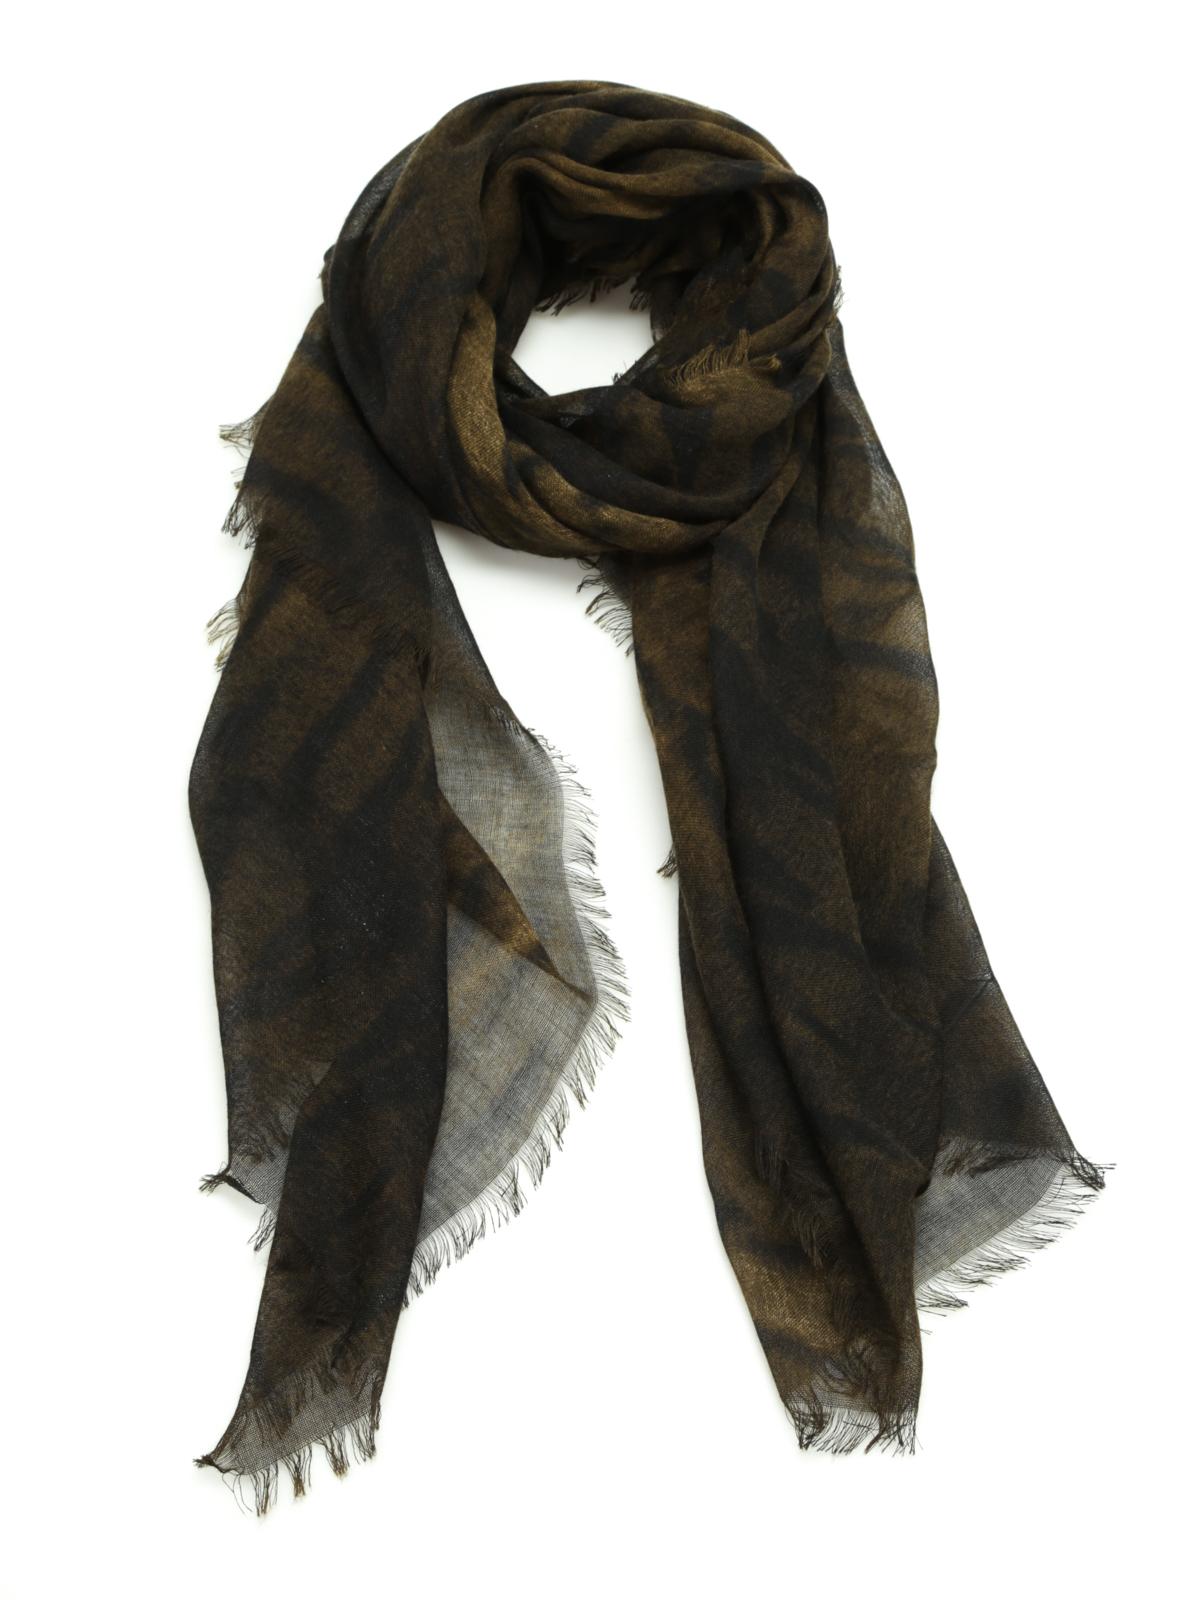 new styles 0de51 5c1fc Roberto Cavalli - Animal print shawl - Stoles & Shawls ...